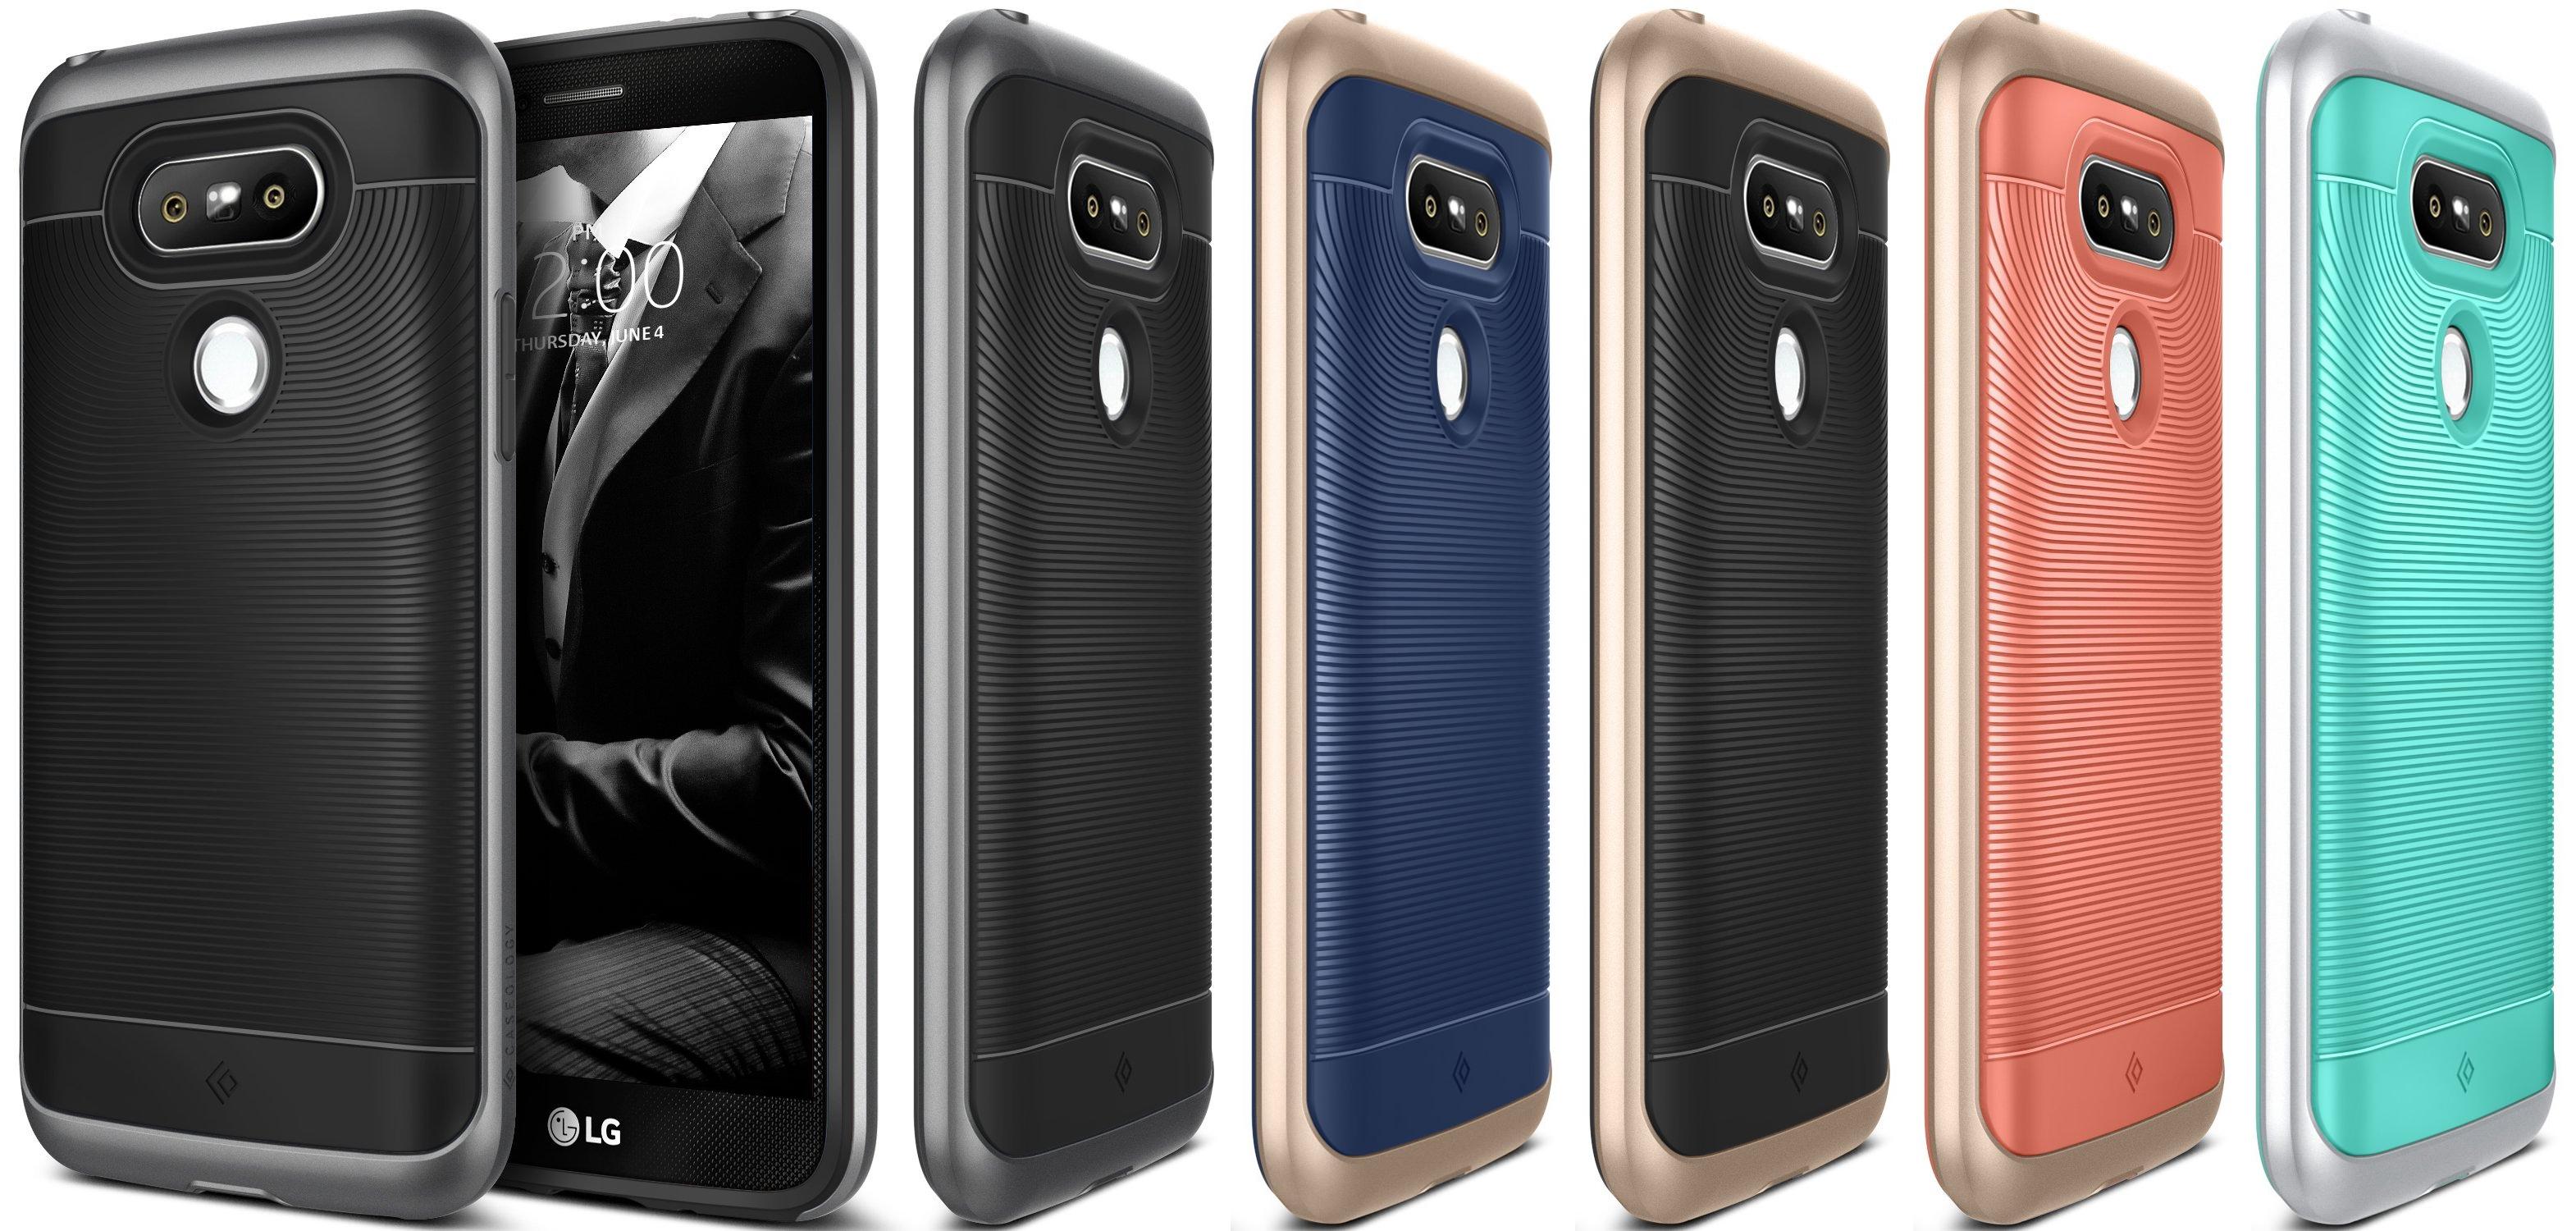 LG G5 Textured Grip Cover Shock Proof .jpg